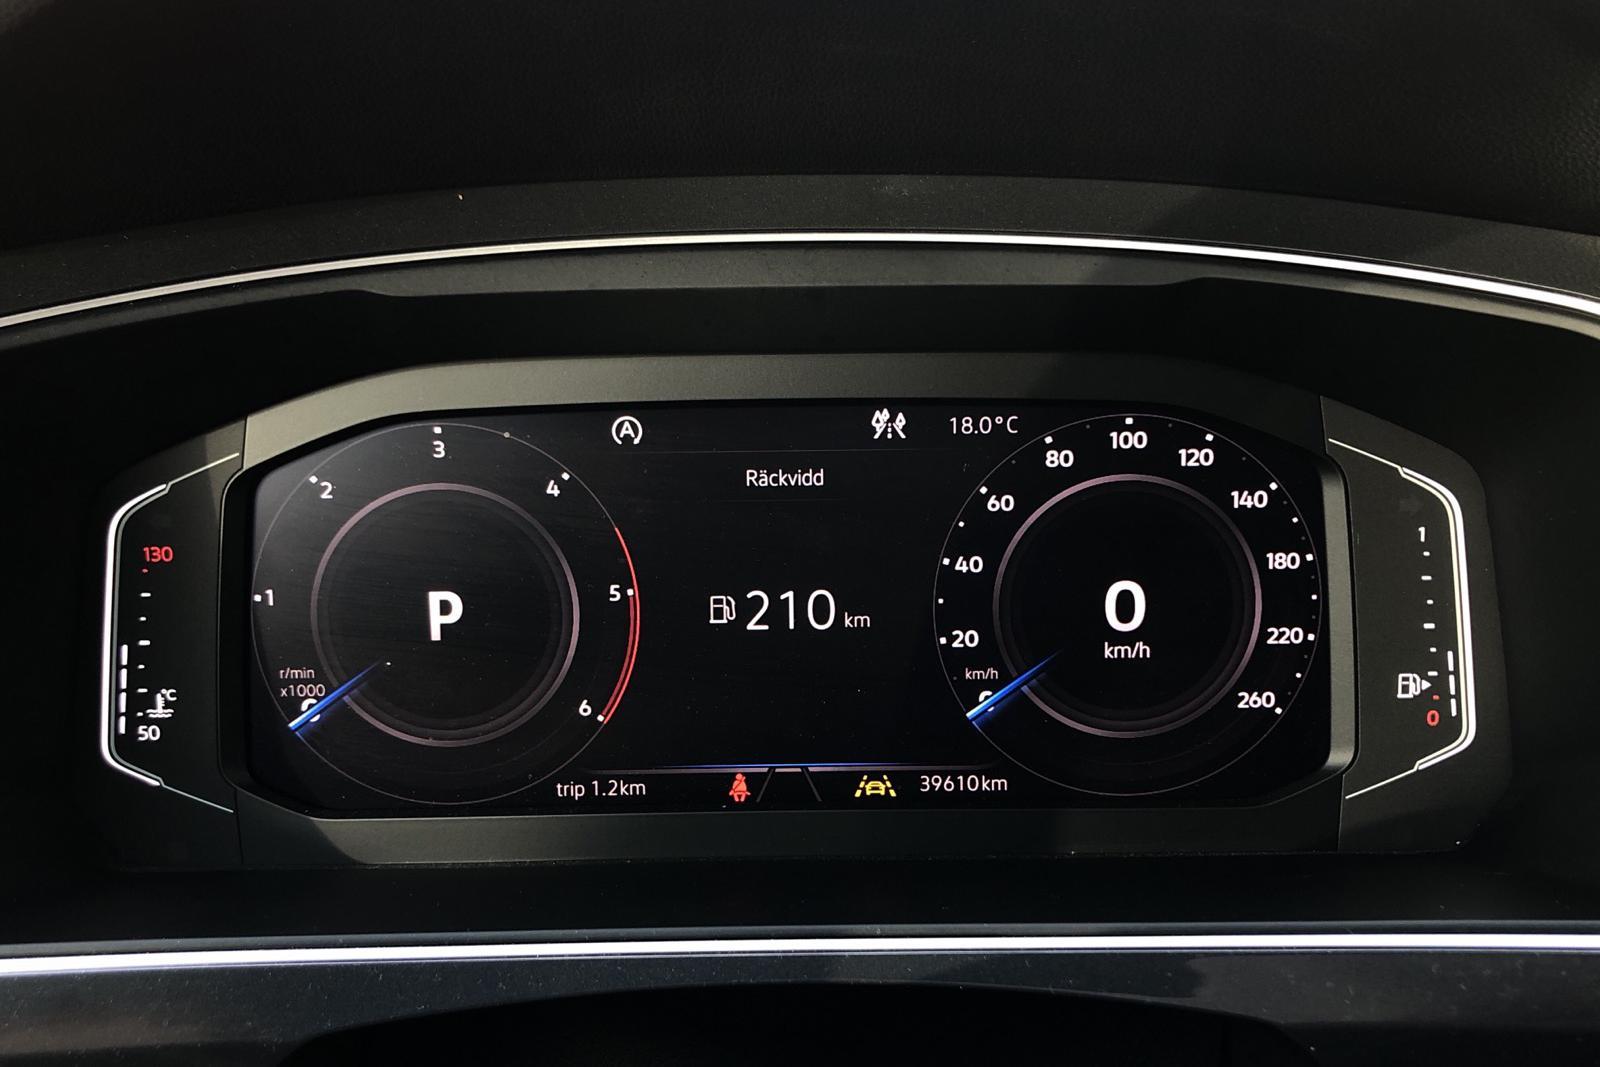 VW Tiguan 2.0 TDI 4MOTION (190hk) - 3 961 mil - Automat - Dark Grey - 2020